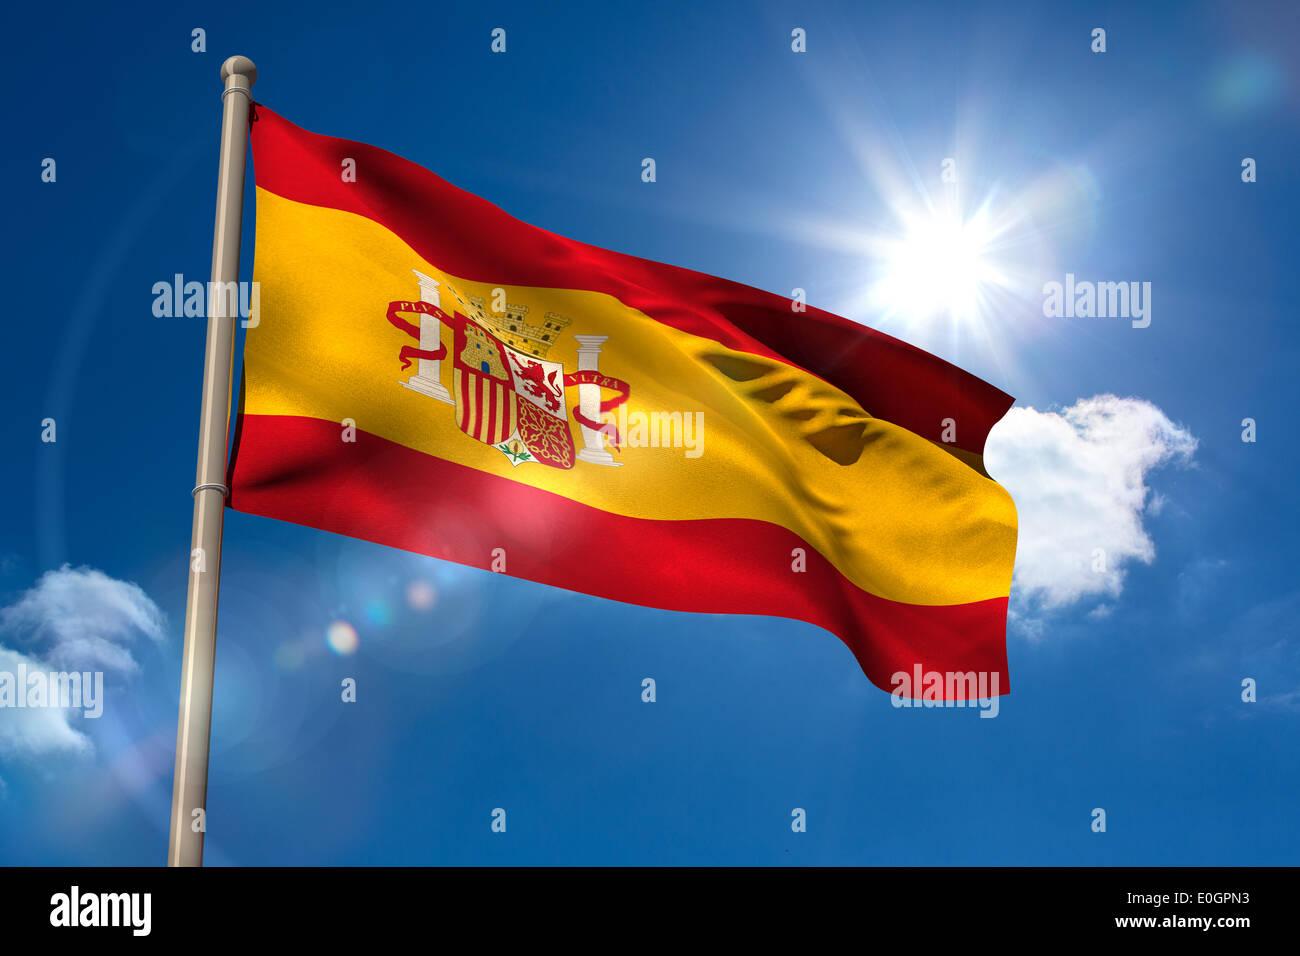 Spain national flag on flagpole - Stock Image